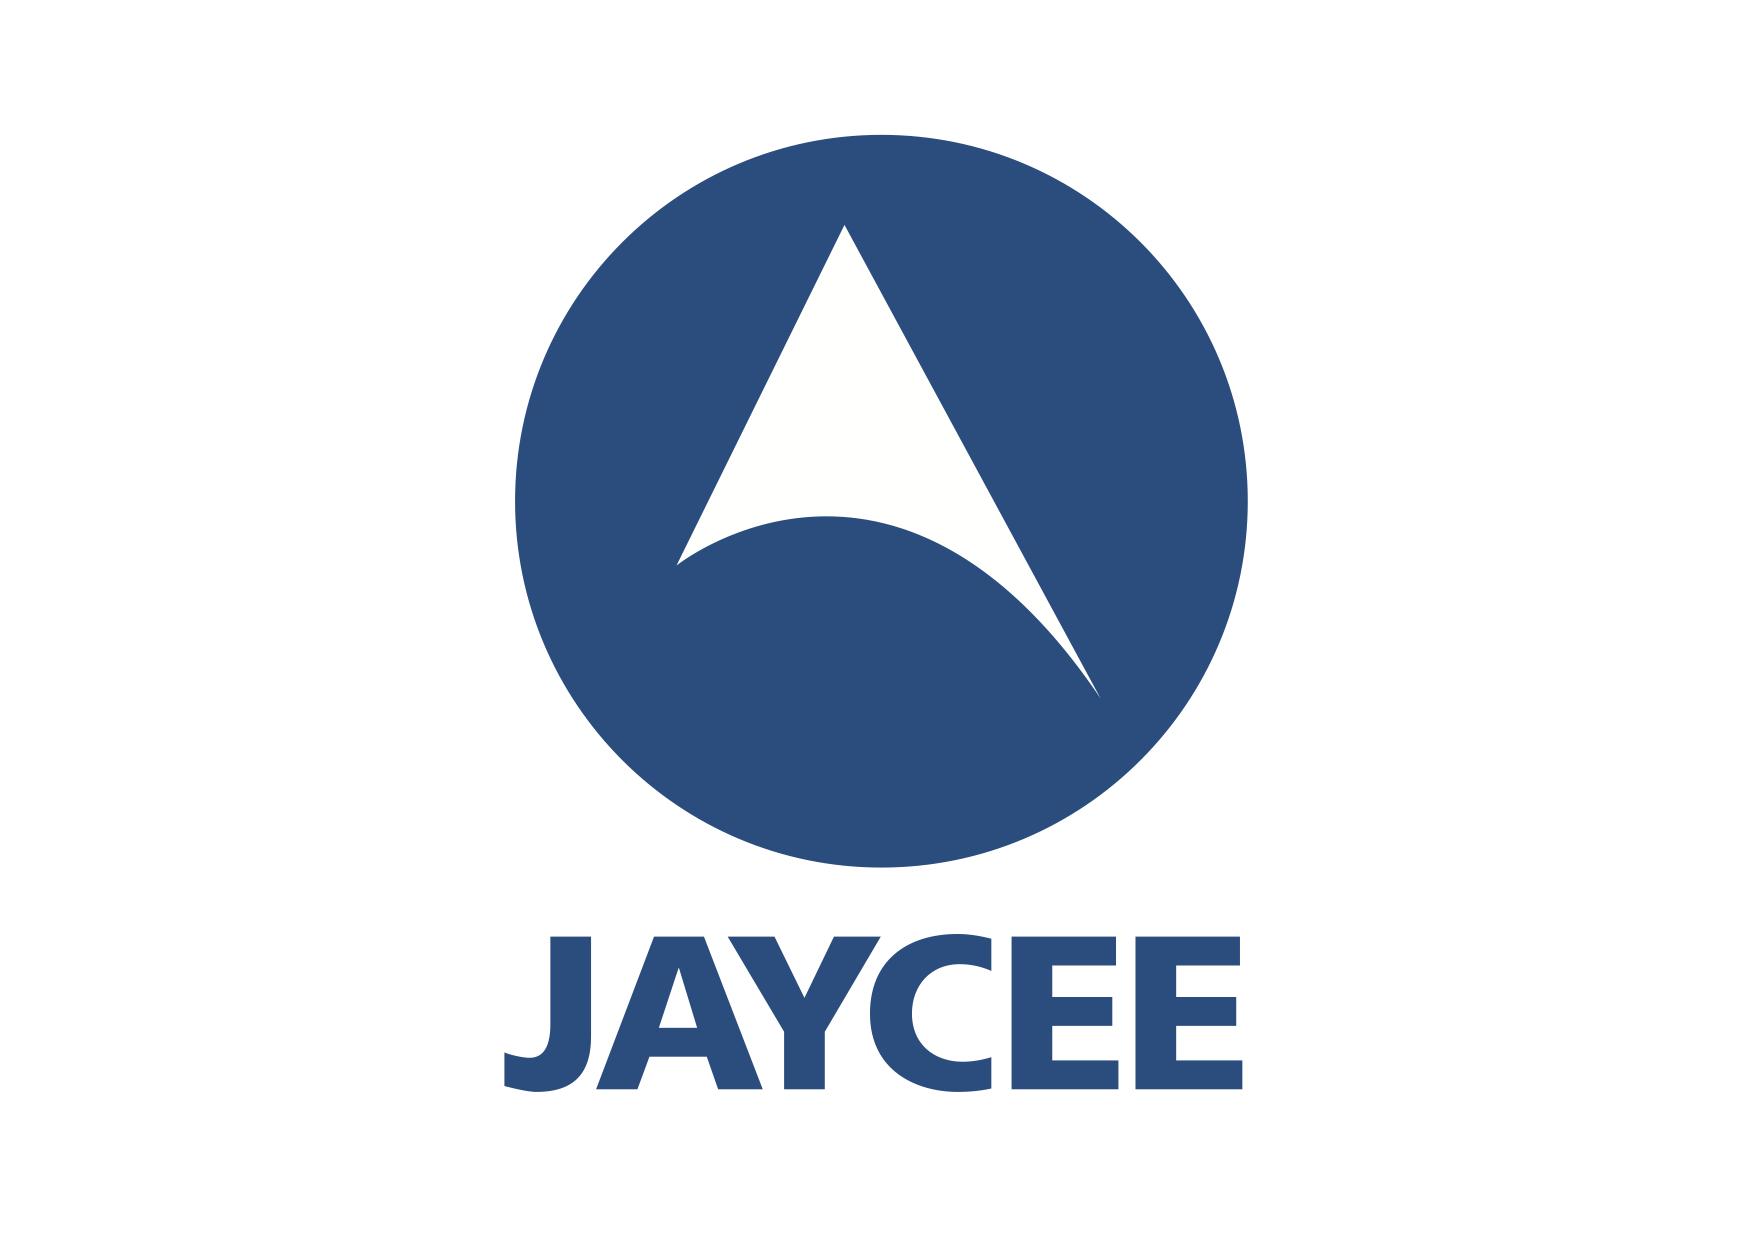 Jaycee_logo.jpg